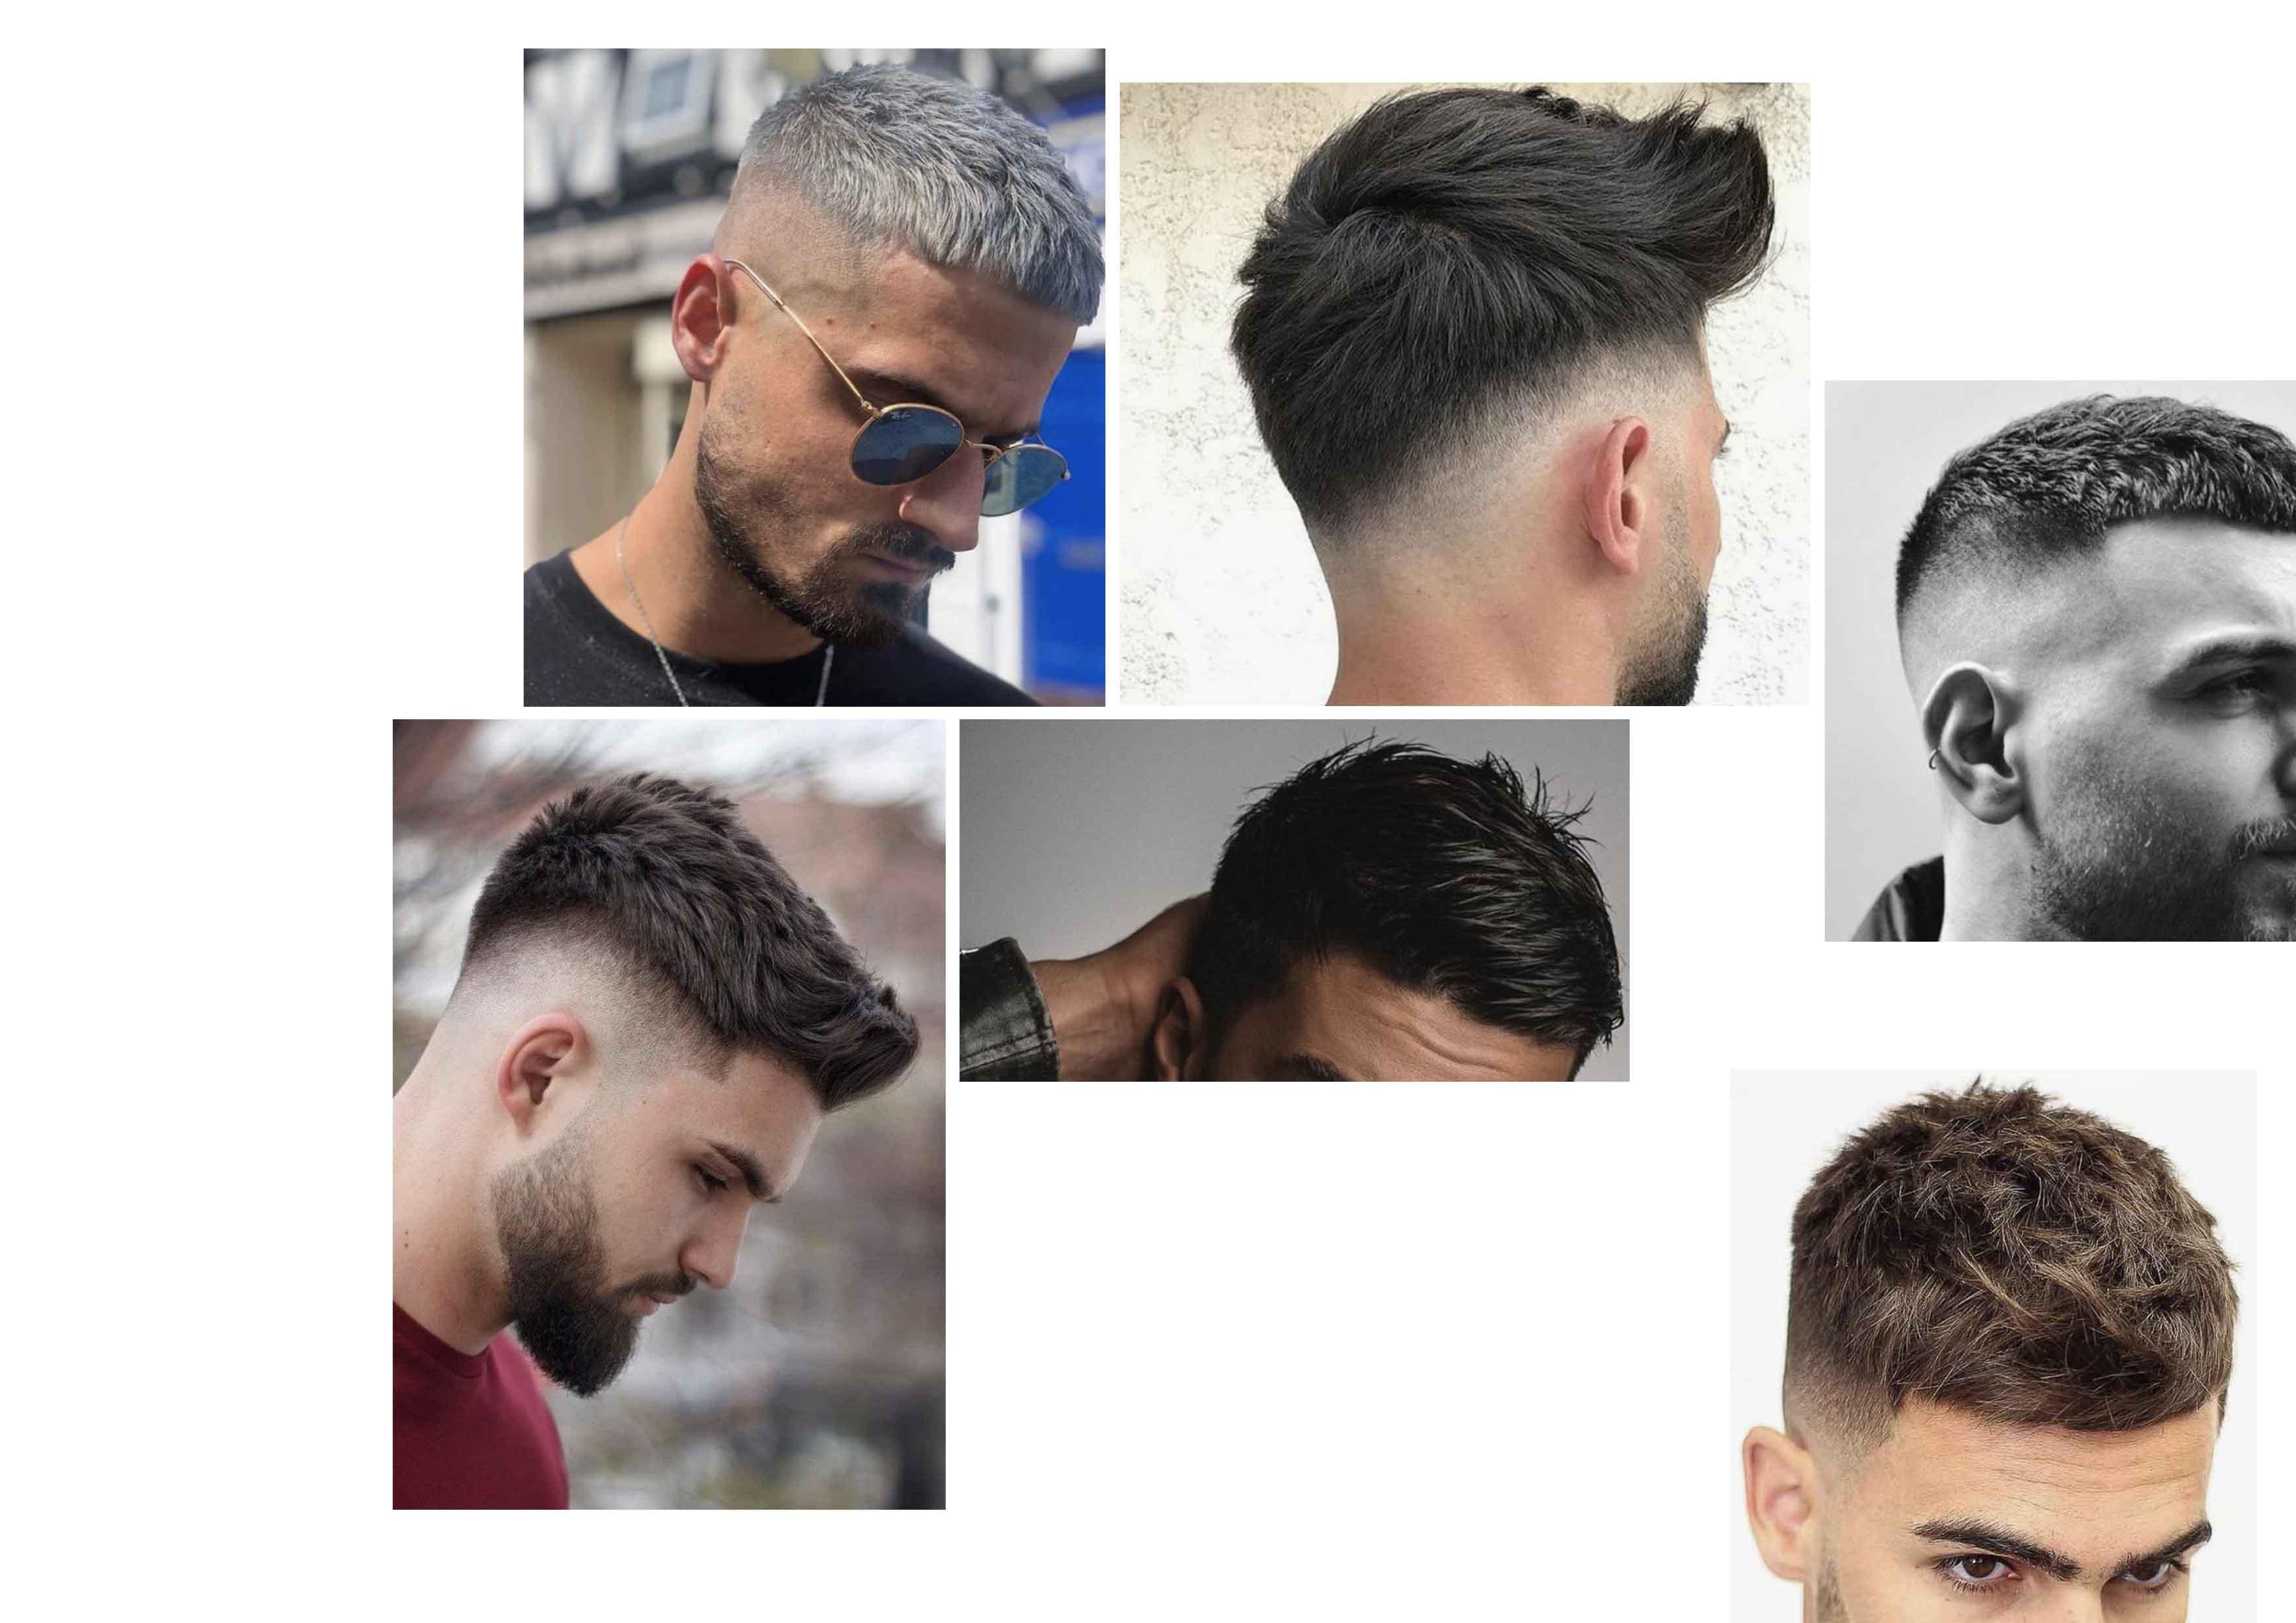 Coupe courte homme 2020 | Coiffures courtes cheveux courts homme